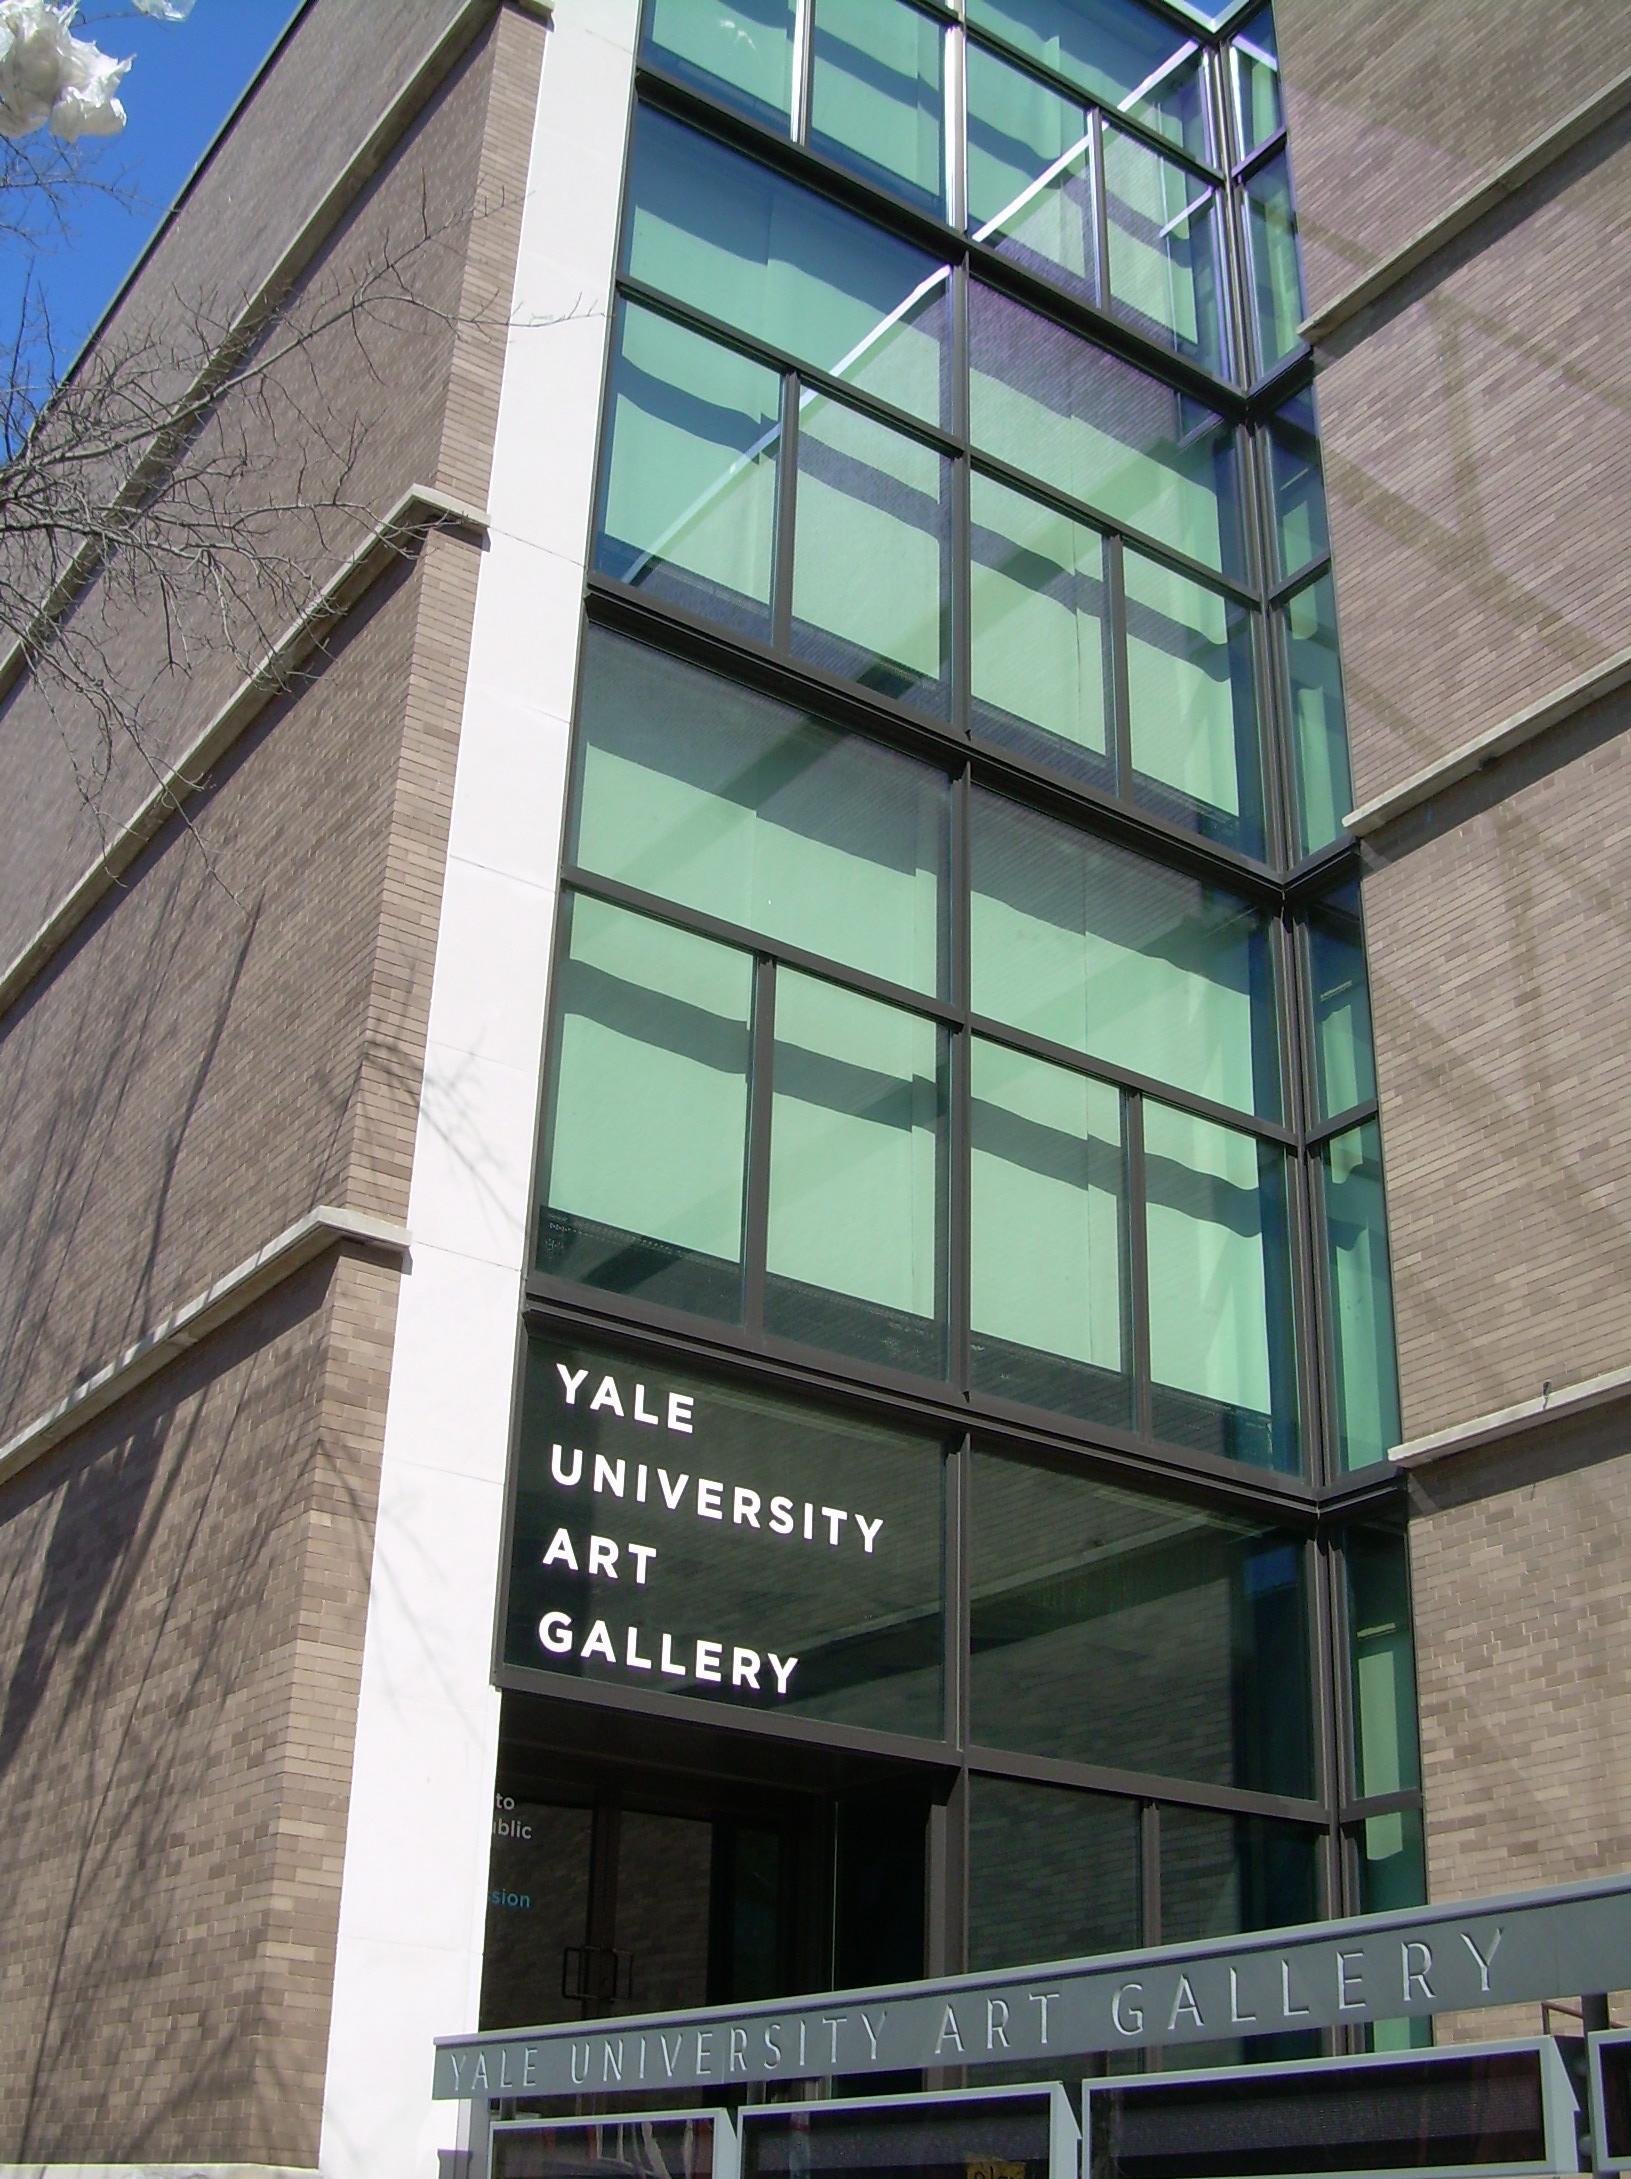 gallery of the university - photo #11